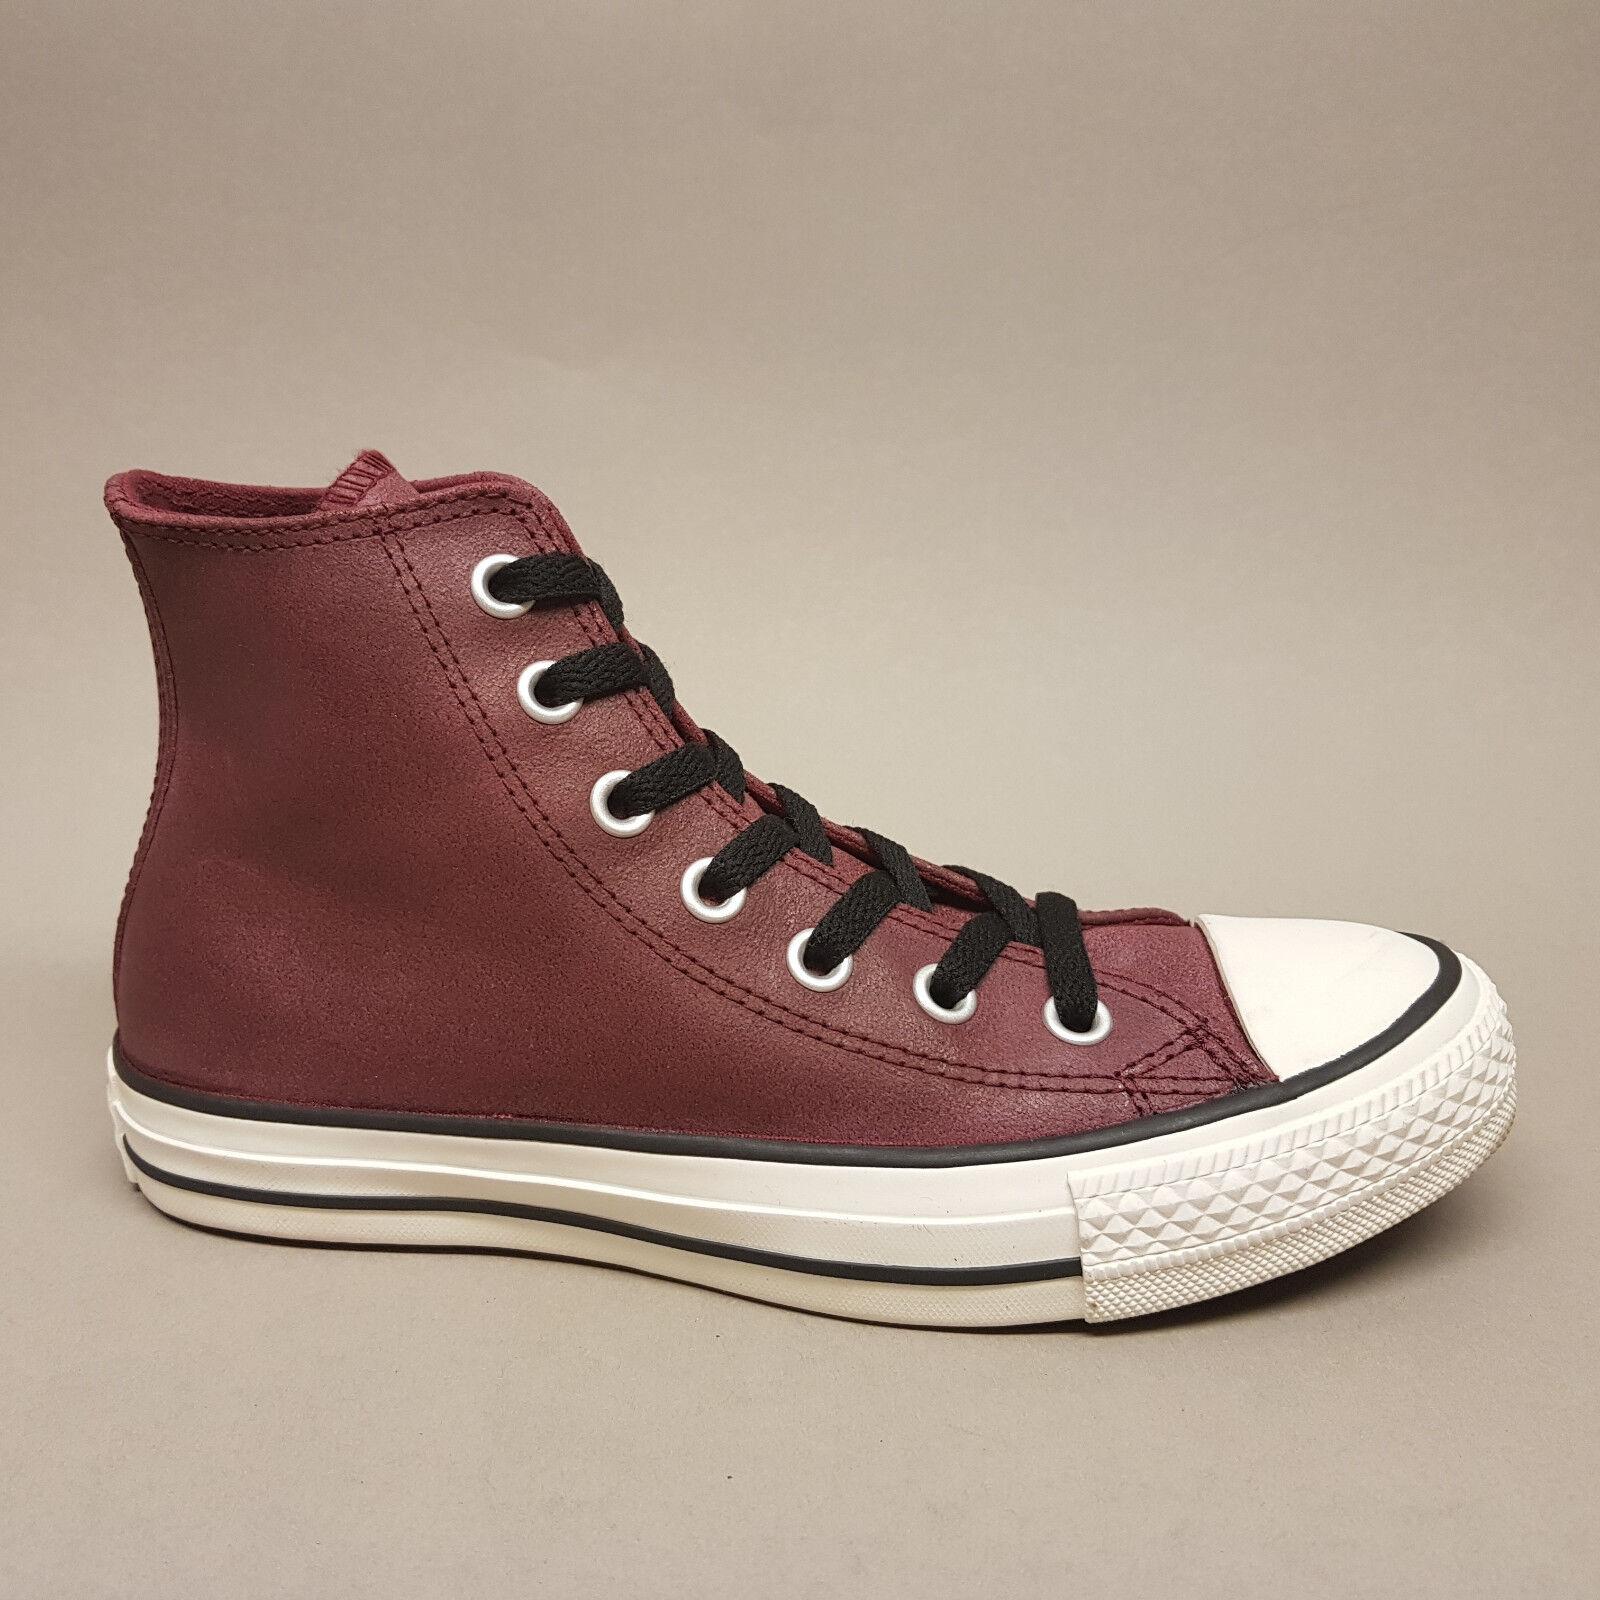 Converse All Star Chuck Hi Oxheart Leather 144762C Turnschuhe Leder rot Gr. 37